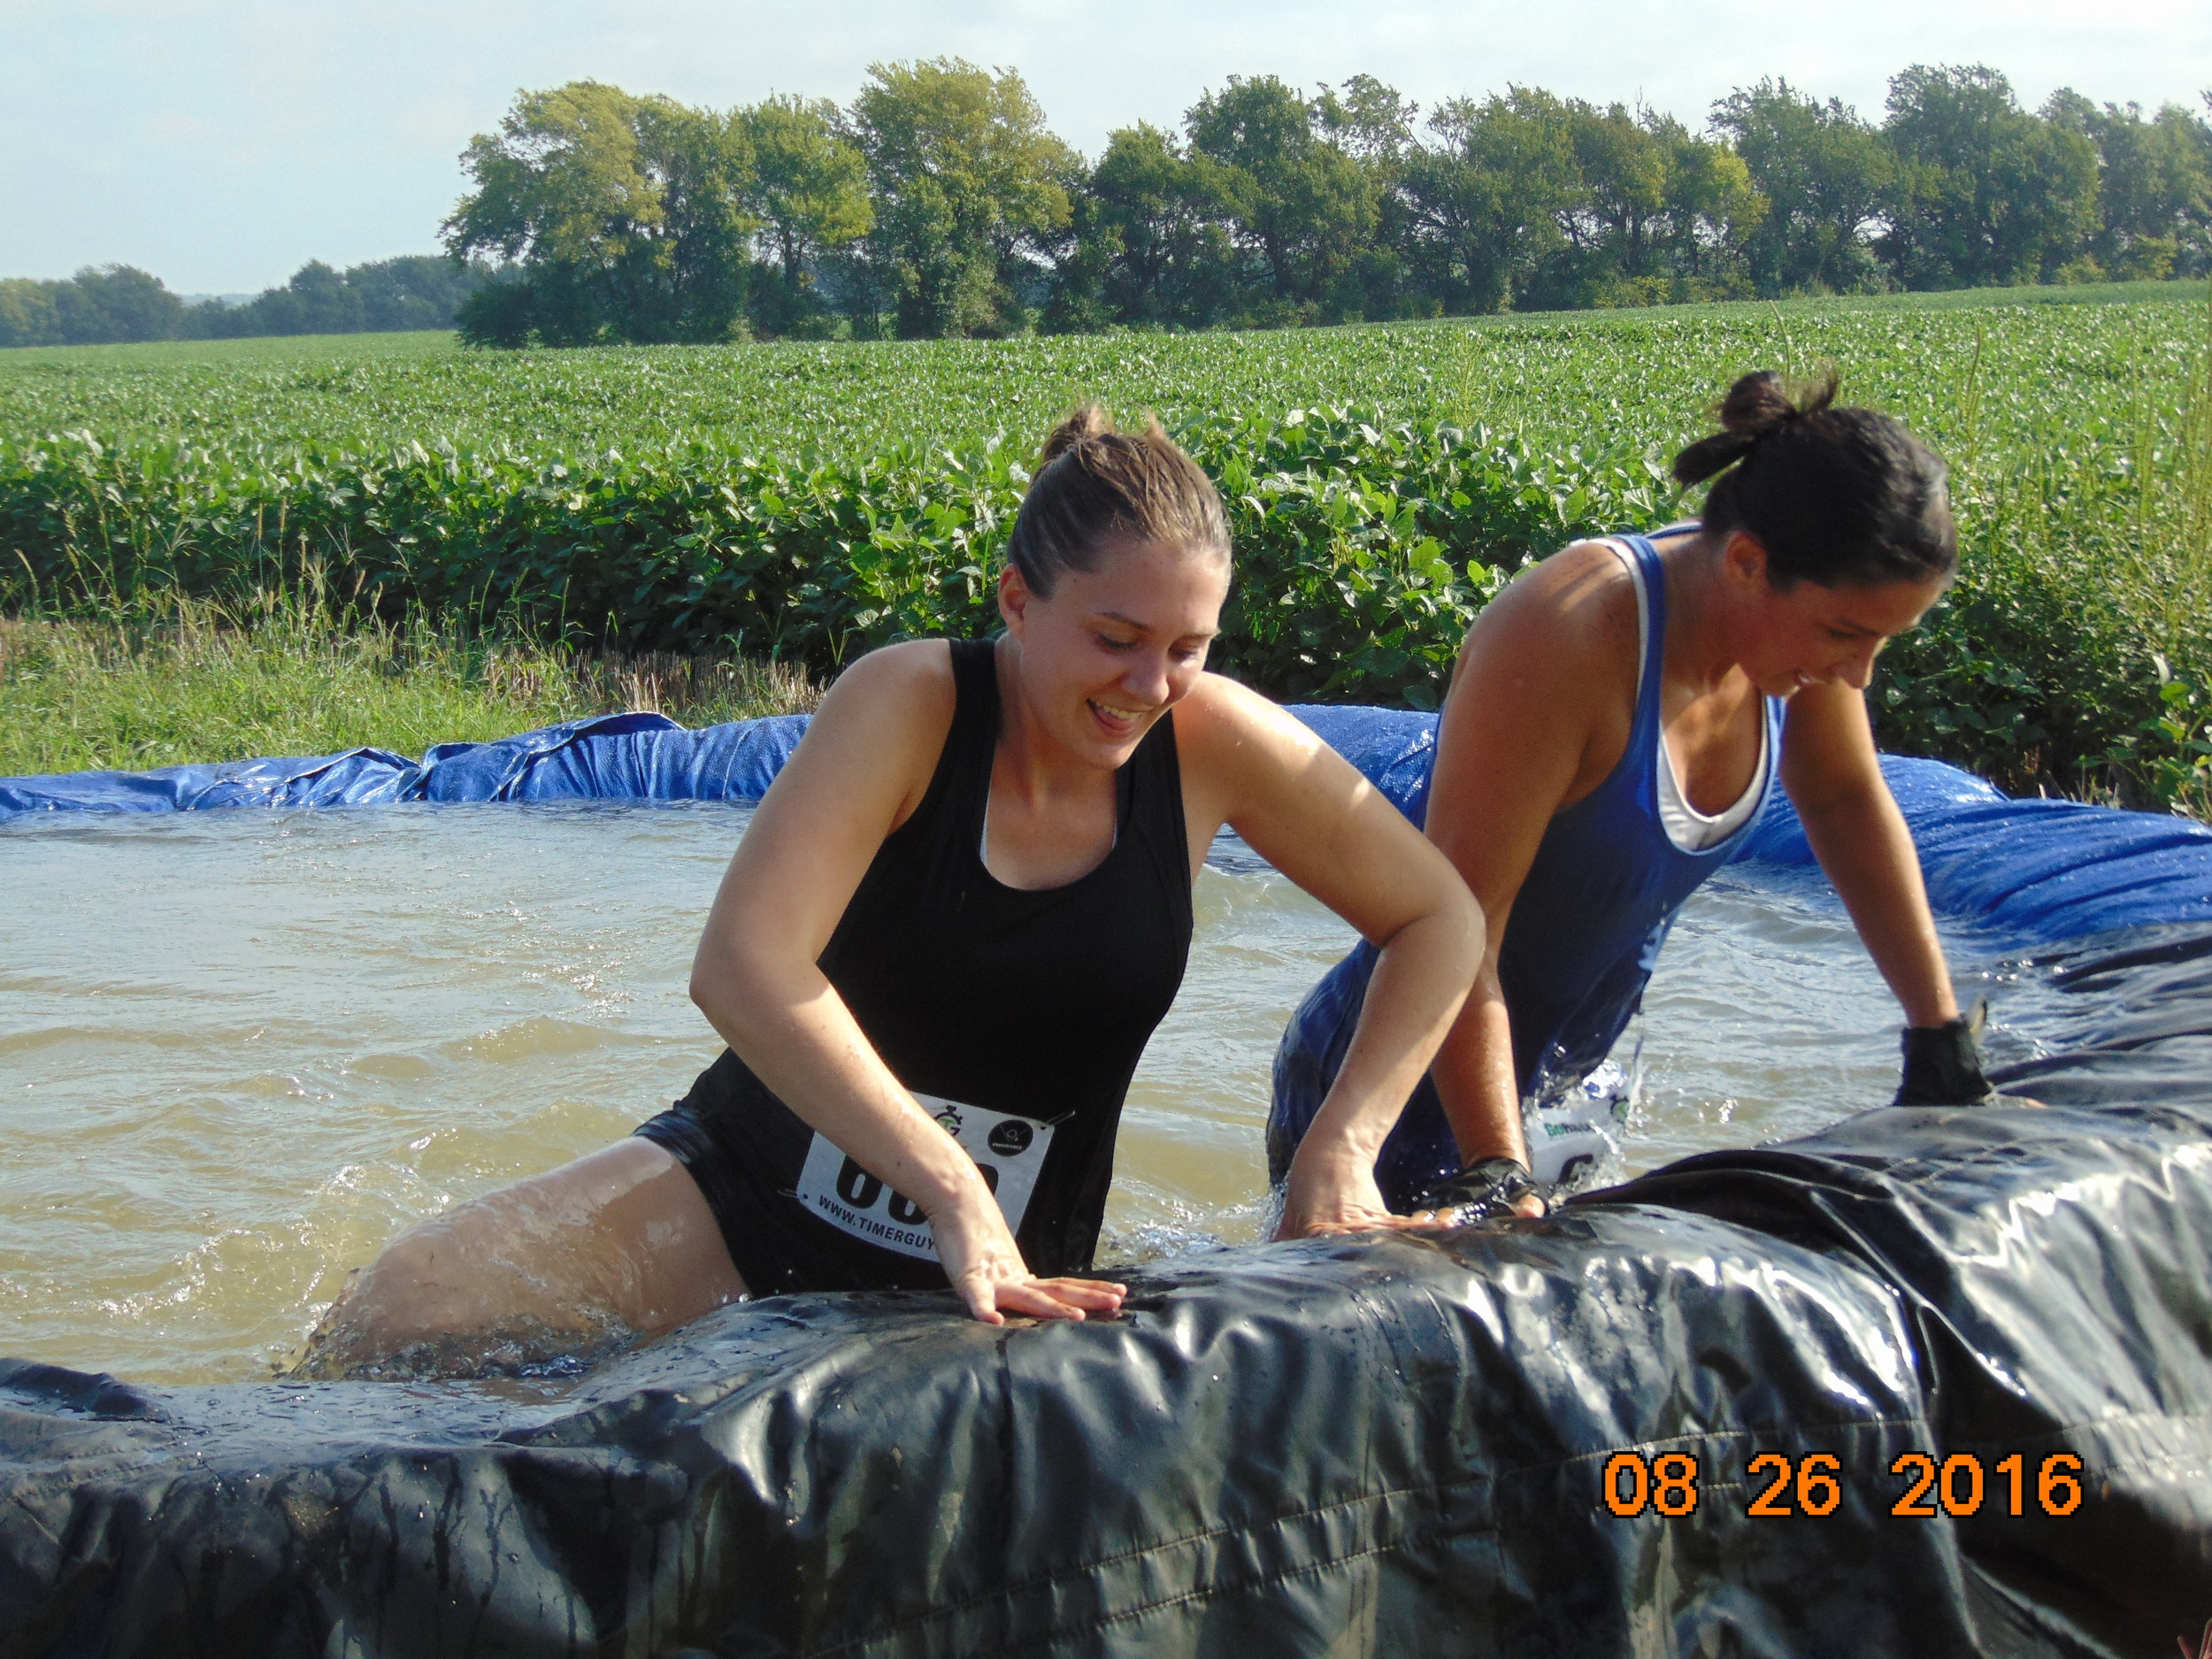 12396715-the-battlegrounds-mud-run-obstacle-course_opt.jpg